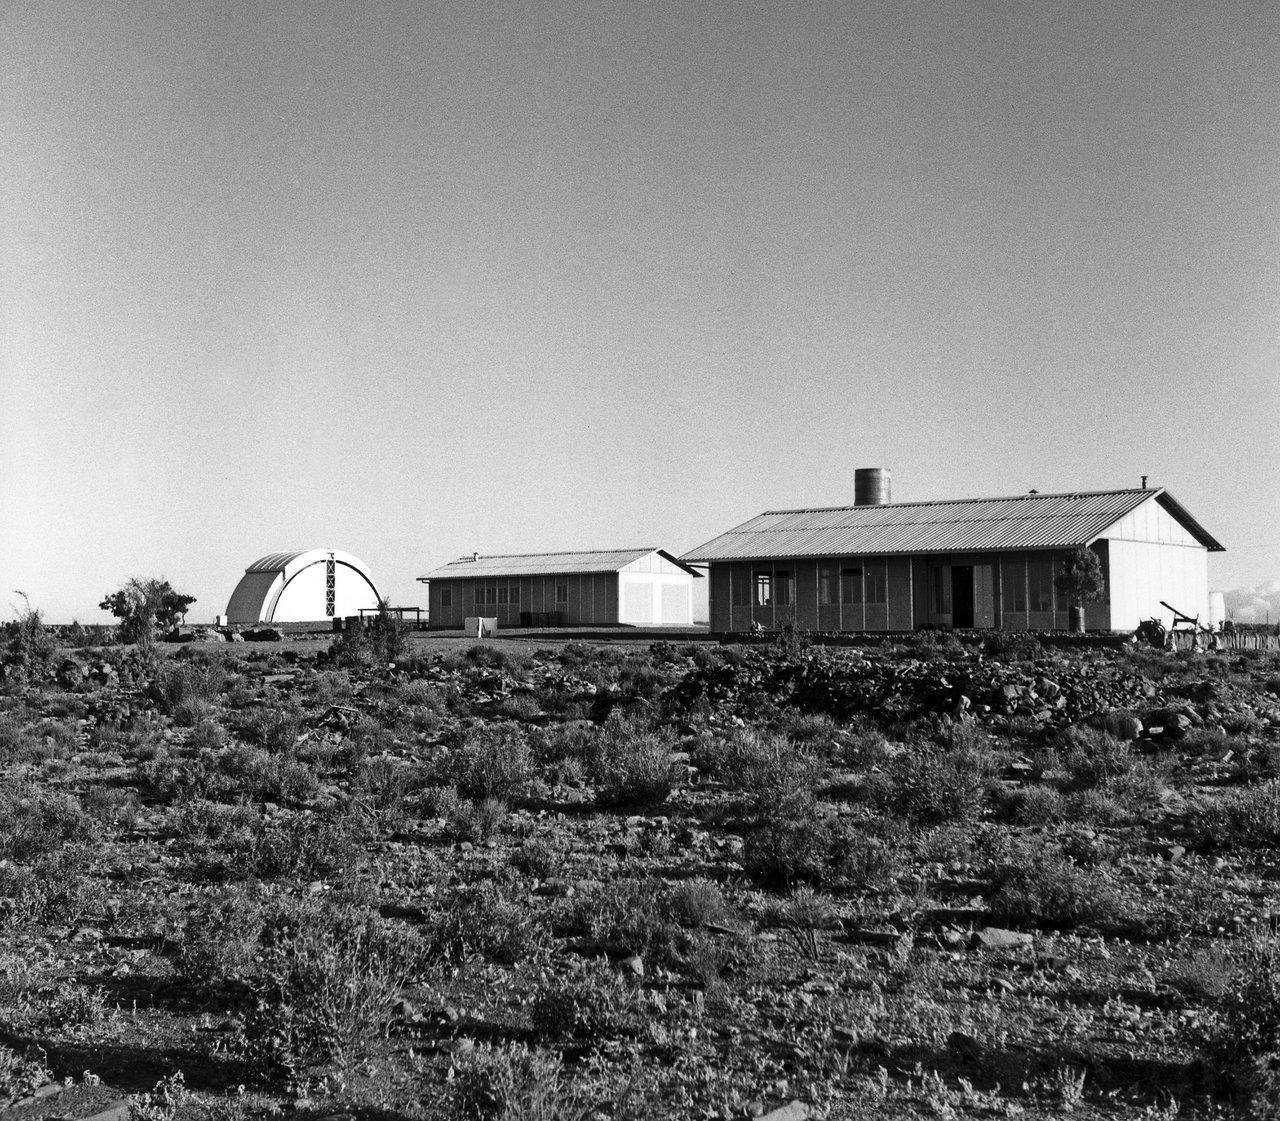 1962 at the Zeekoegat Station